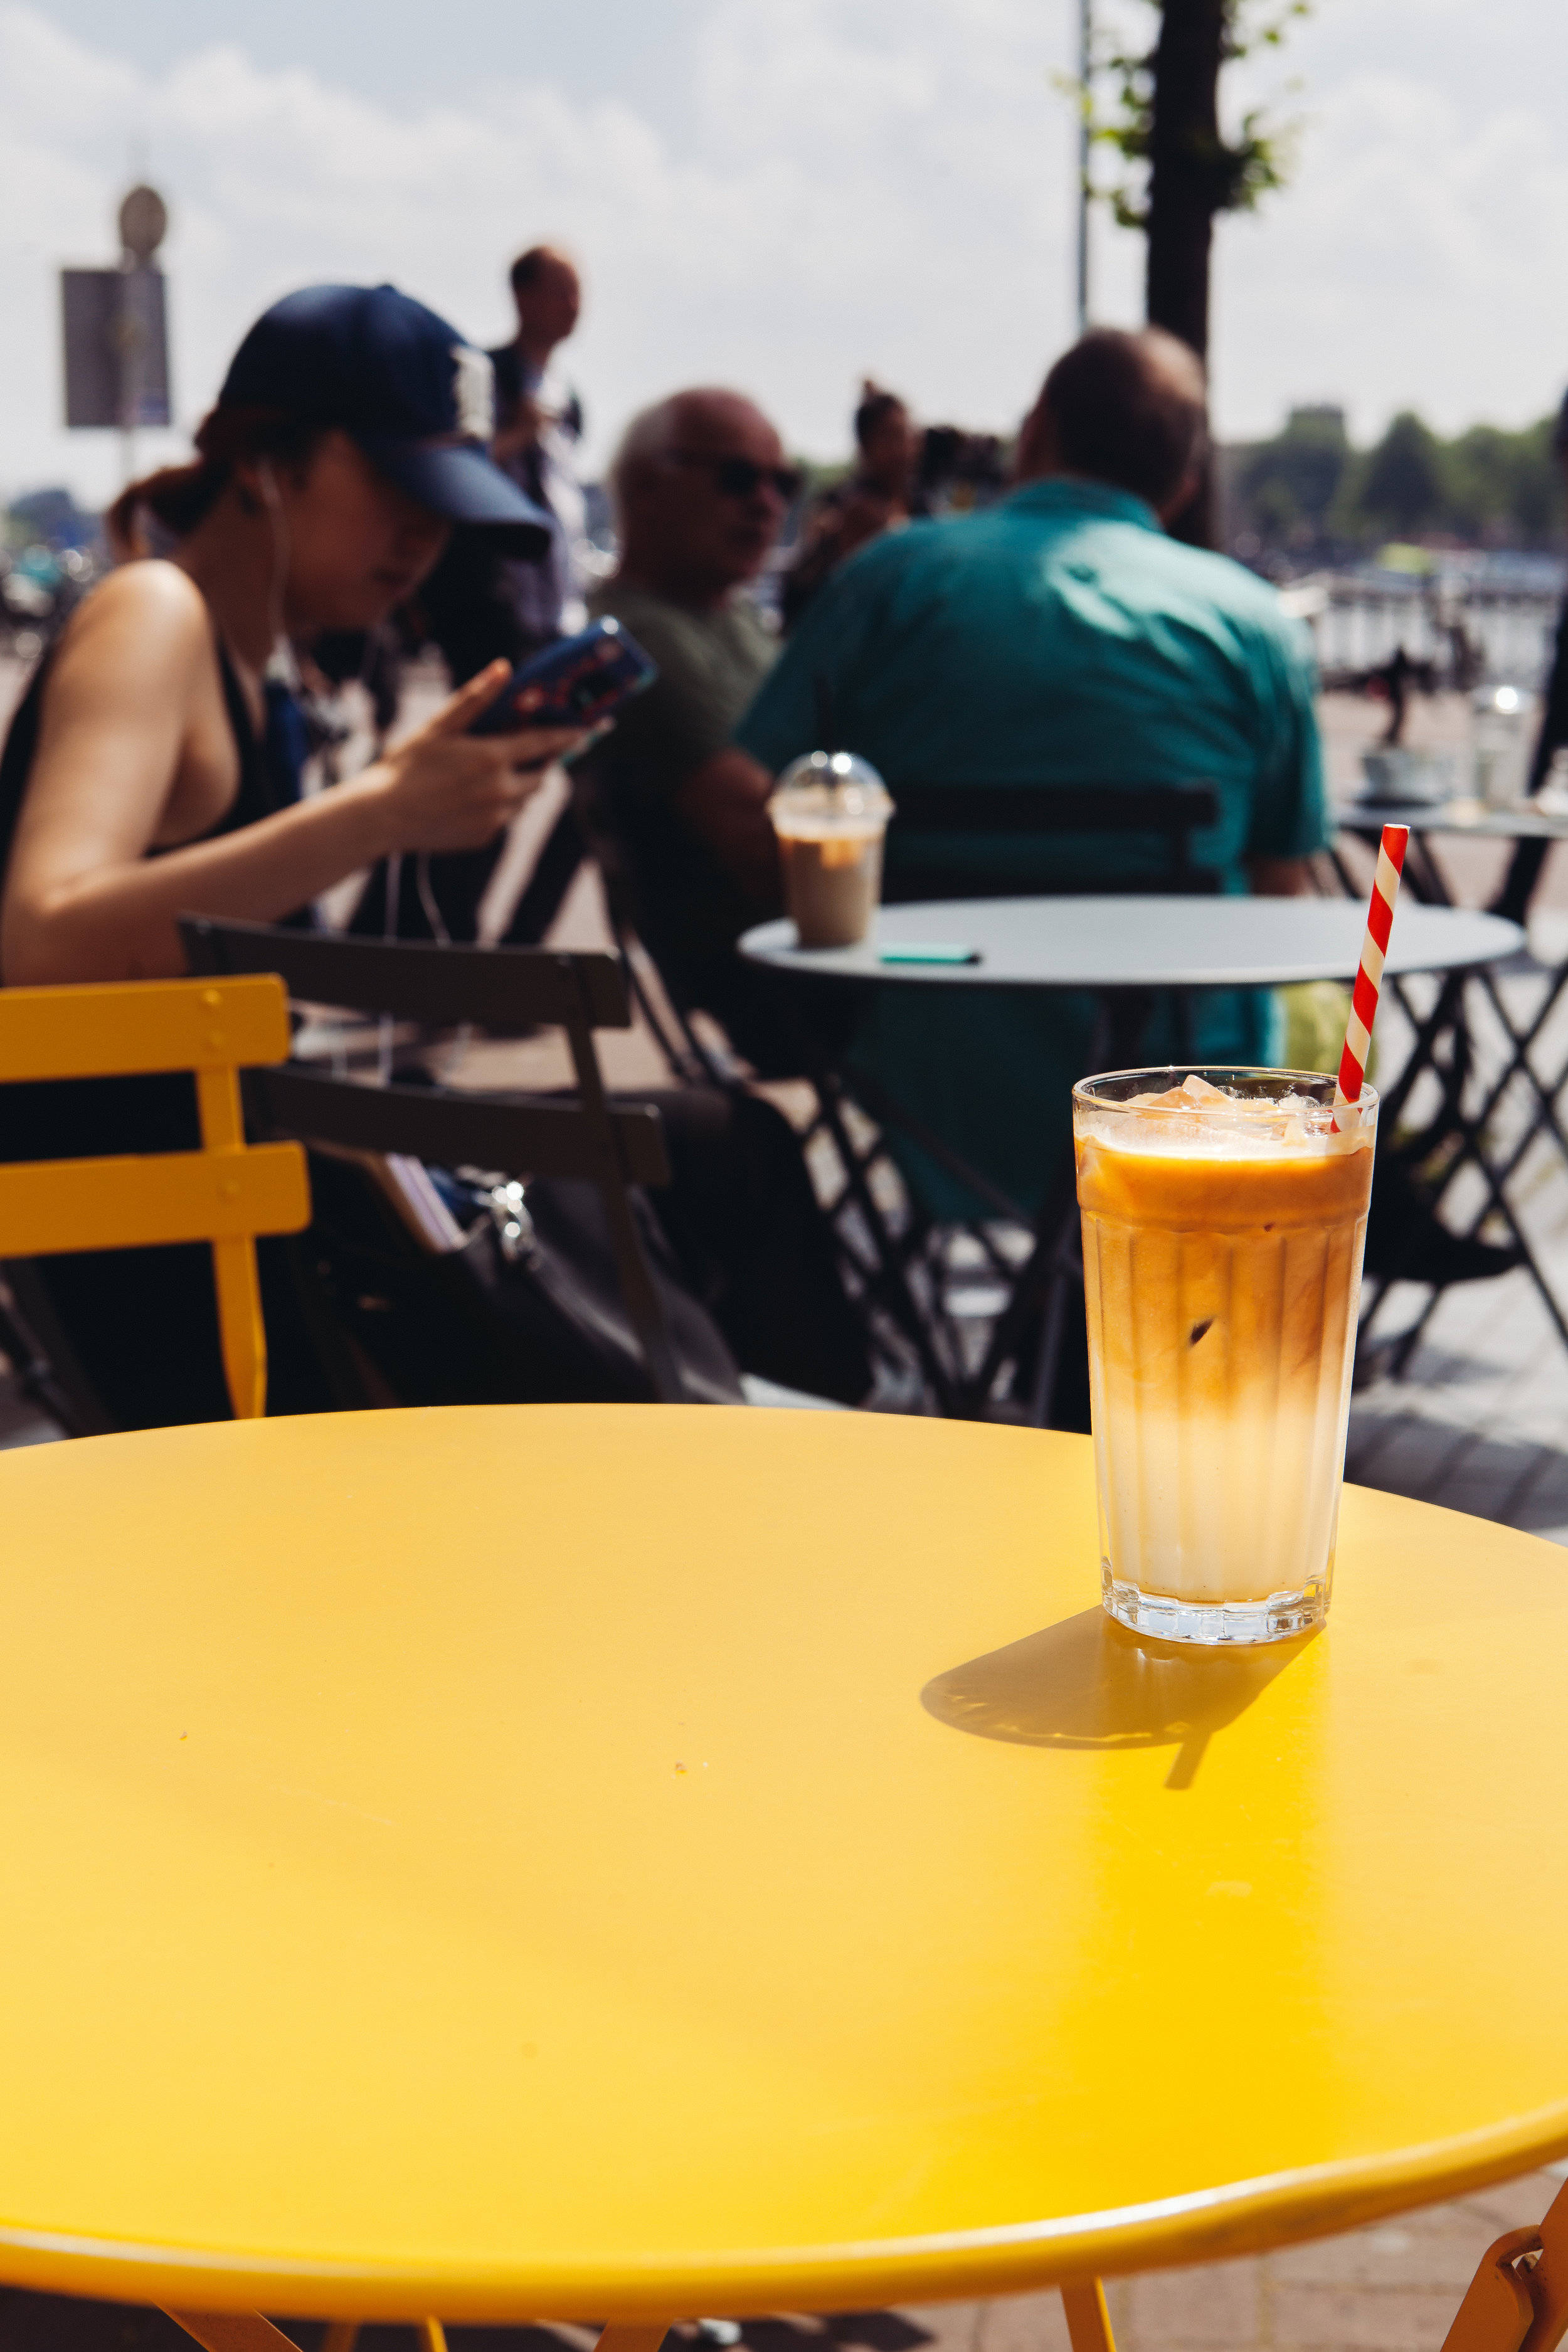 cc summerdrinks iced latte-51.jpg